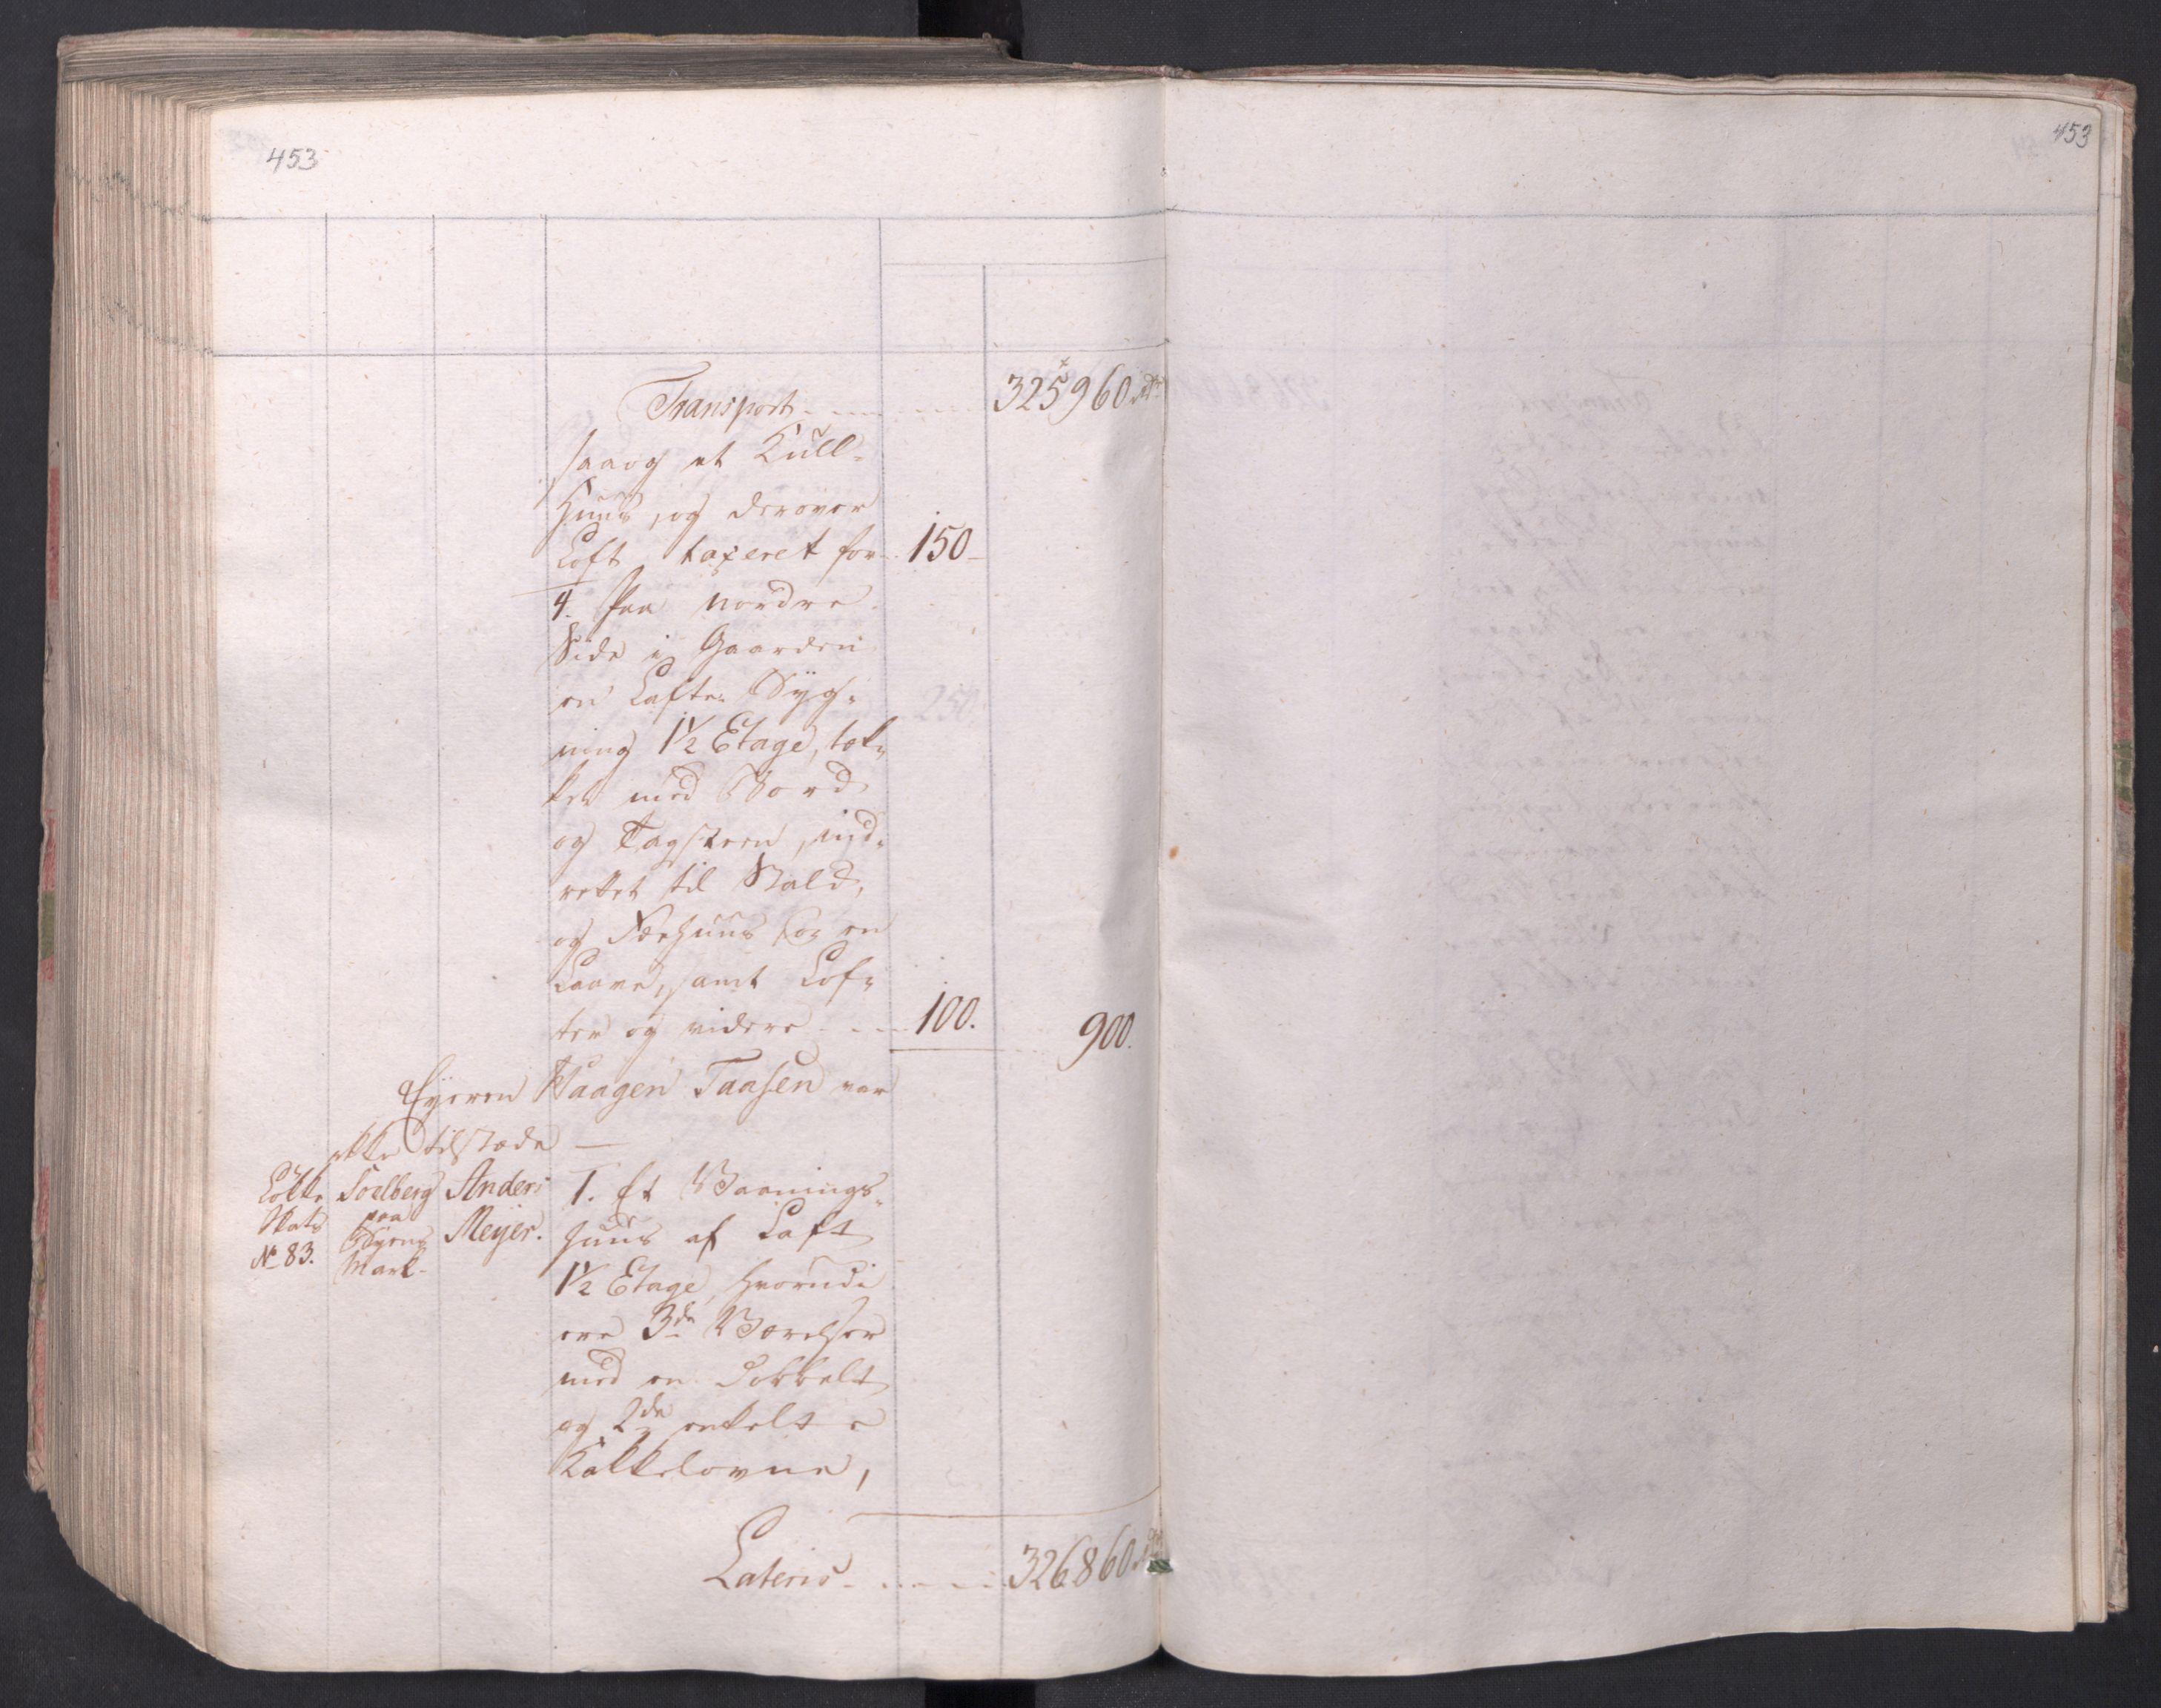 SAO, Kristiania stiftamt, I/Ia/L0015: Branntakster, 1797, s. 453